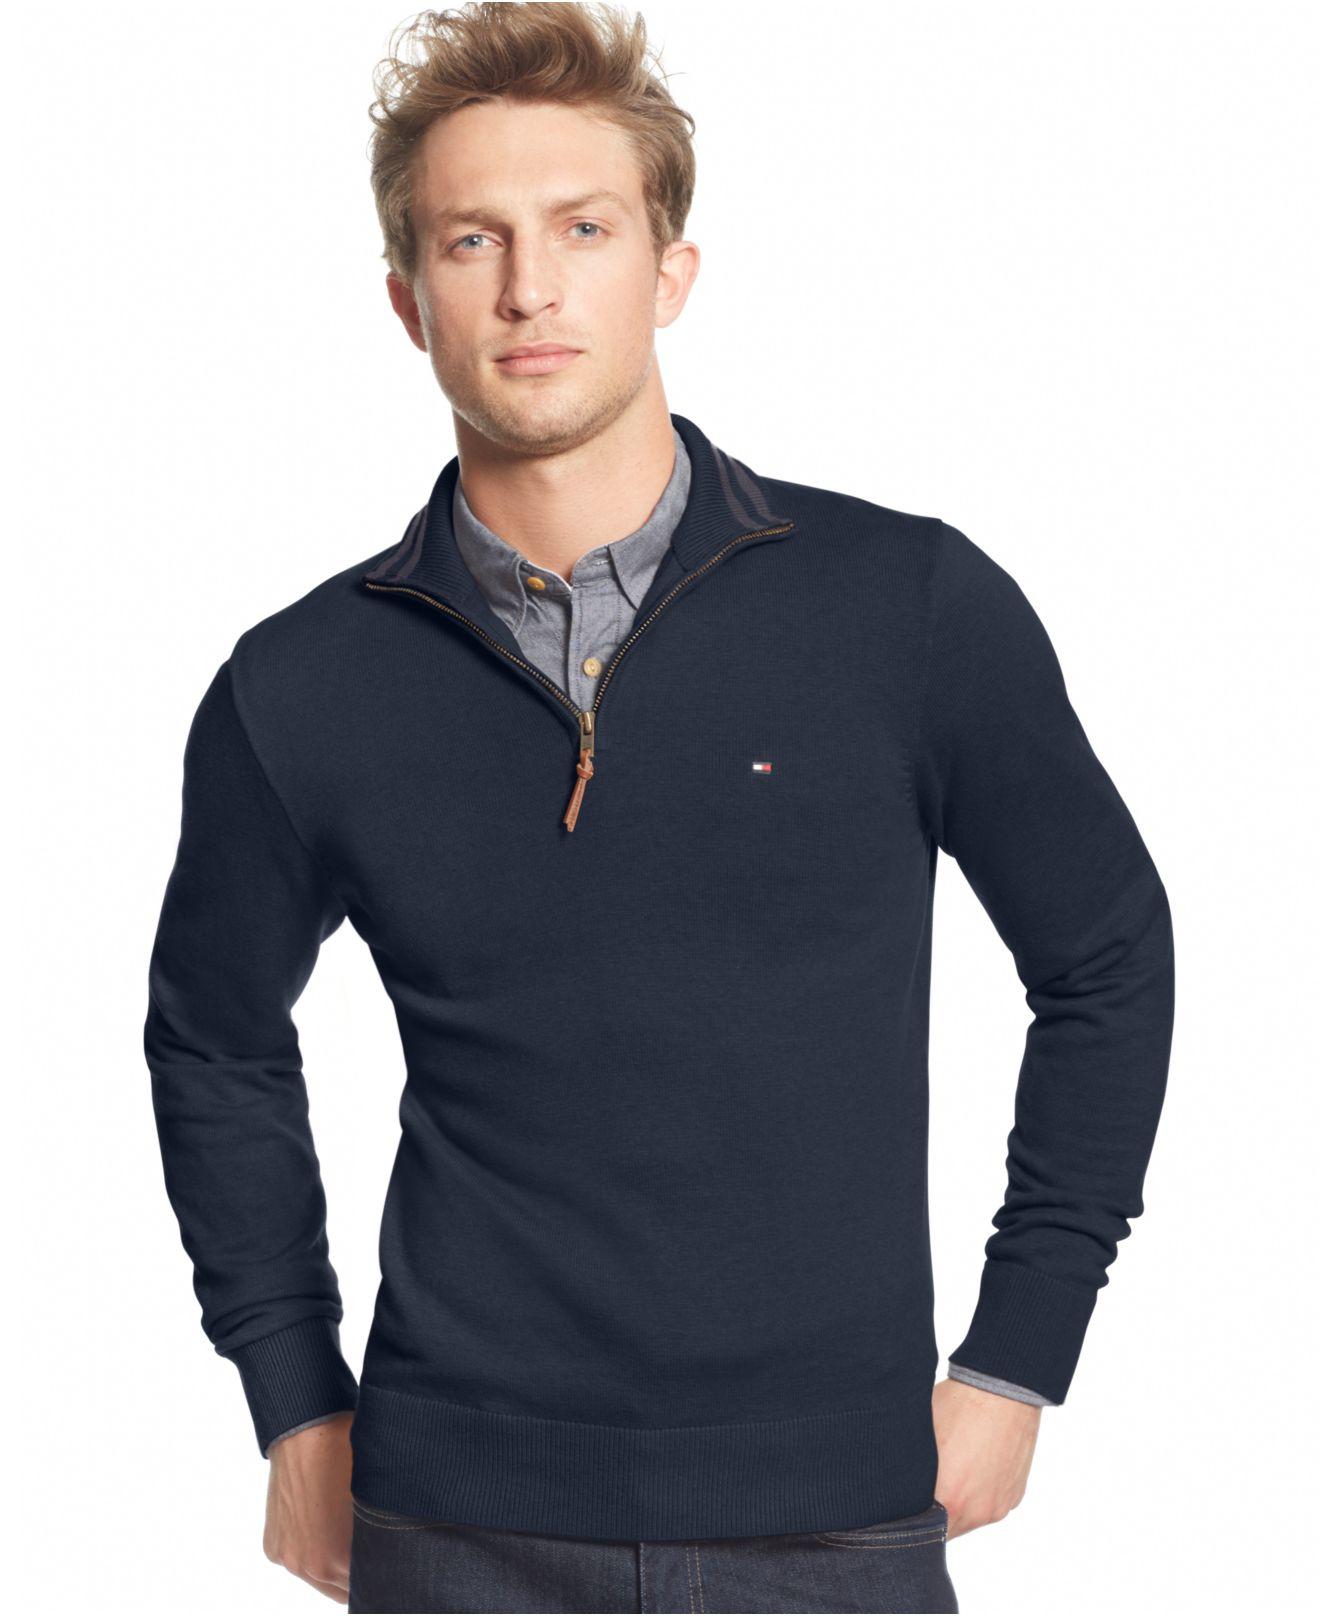 tommy hilfiger zip sweater gray cardigan sweater. Black Bedroom Furniture Sets. Home Design Ideas